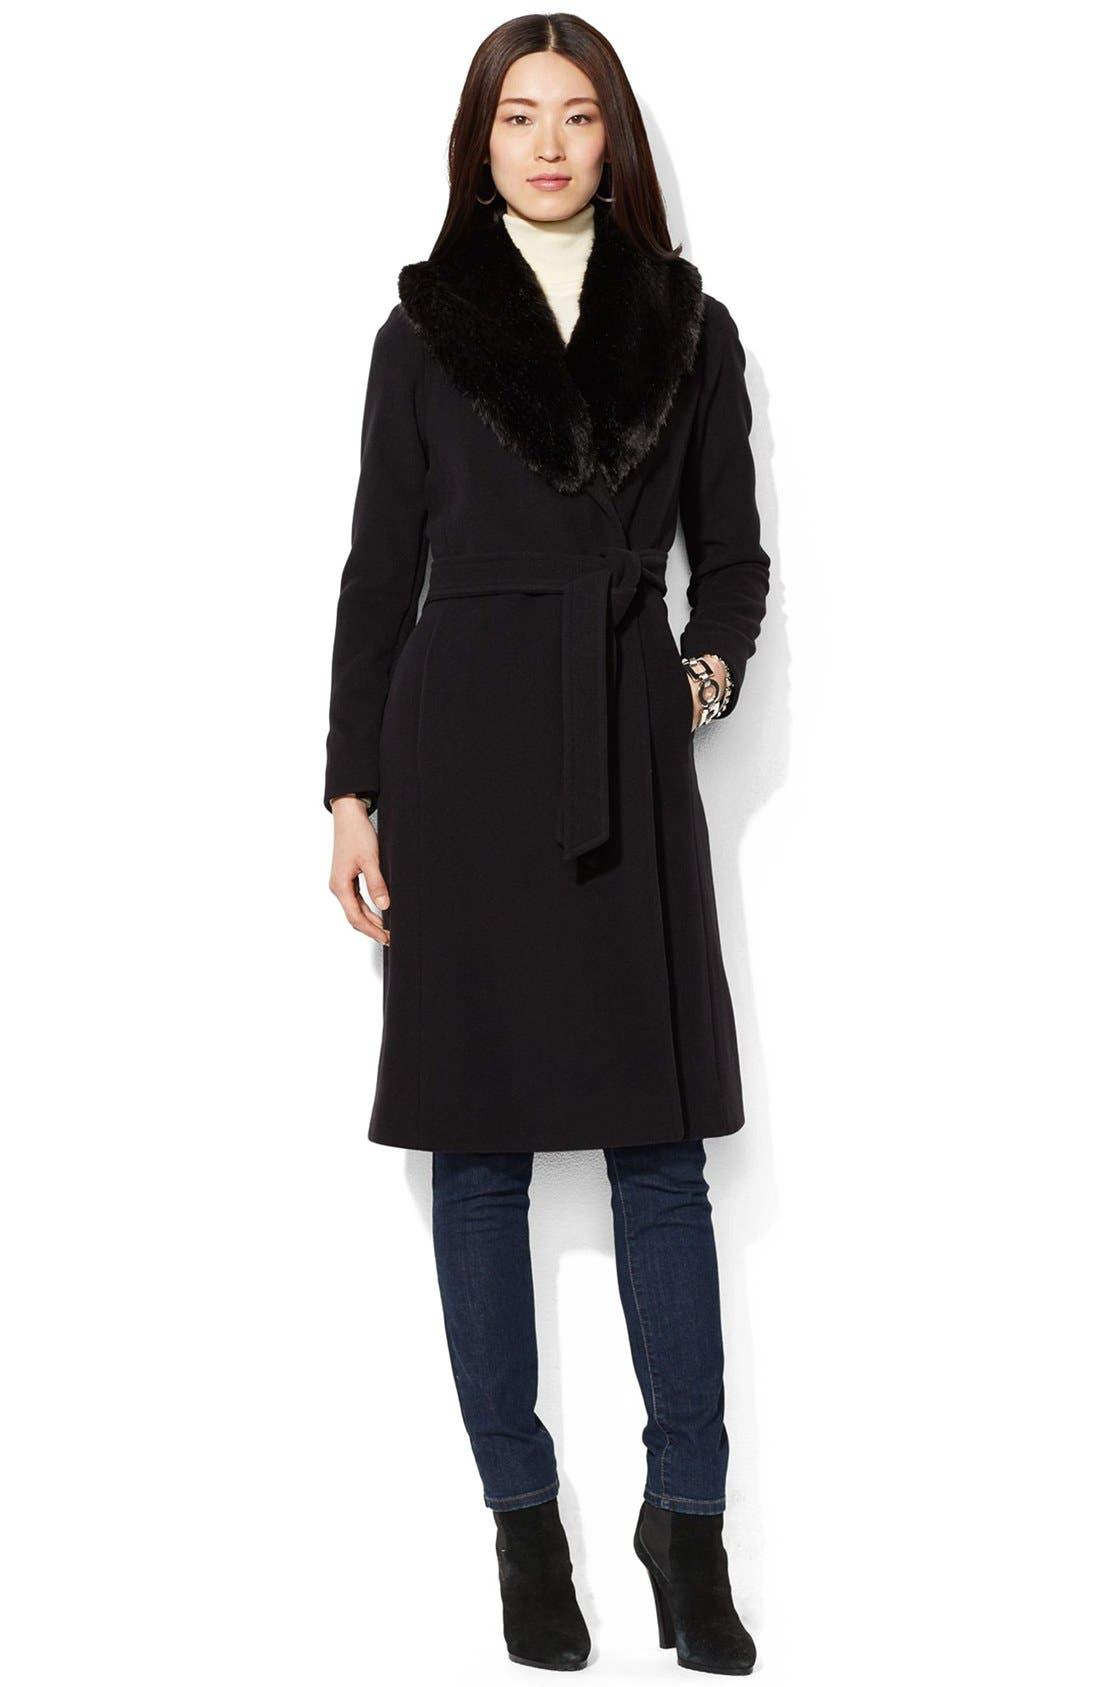 Alternate Image 1 Selected - Lauren Ralph Lauren FauxFur Collar Long Wool Blend Wrap Coat